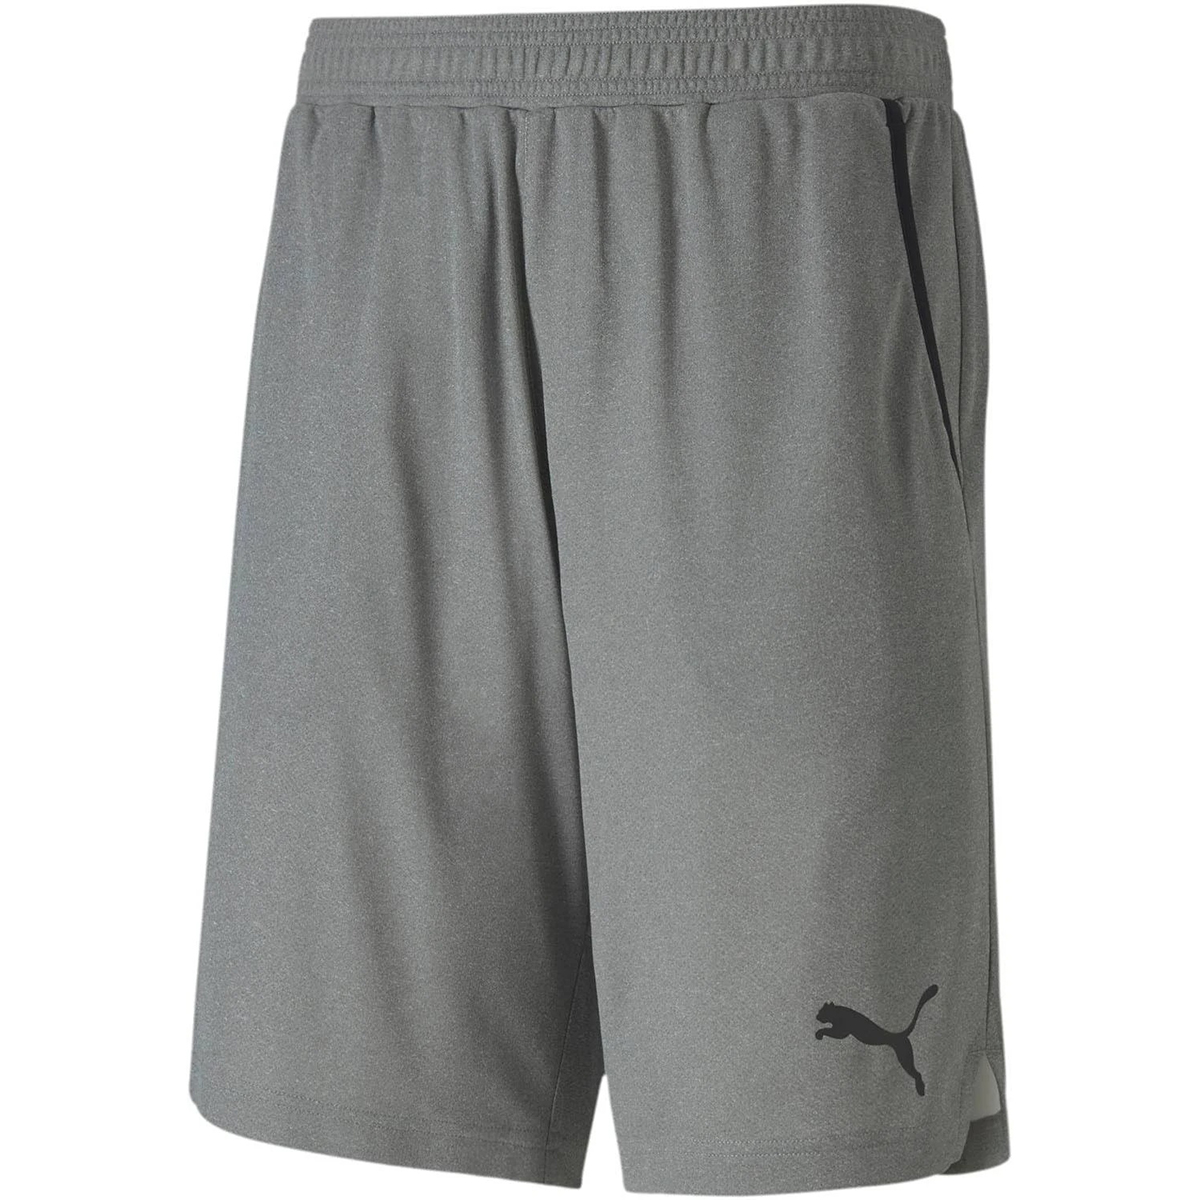 "Puma Men's Rtg Interlock 10"" Shorts - Black, S"